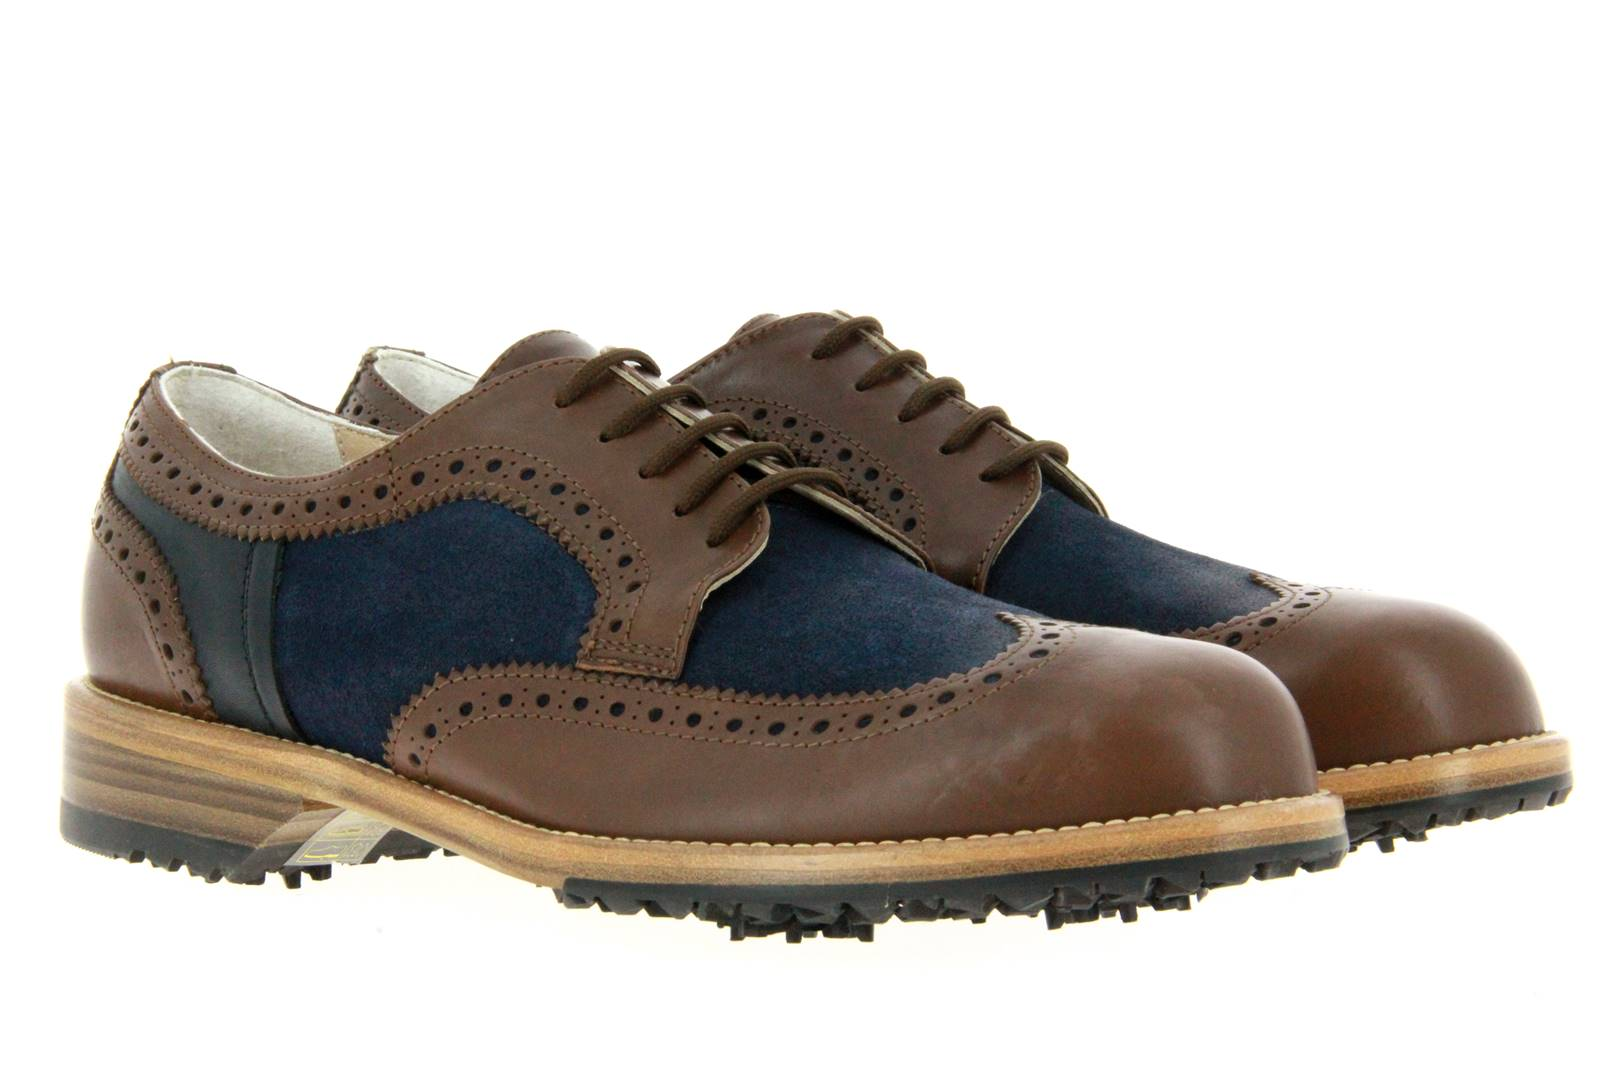 Tee Golf Shoes Herren- Golfschuh JASON MORO BLU (46)